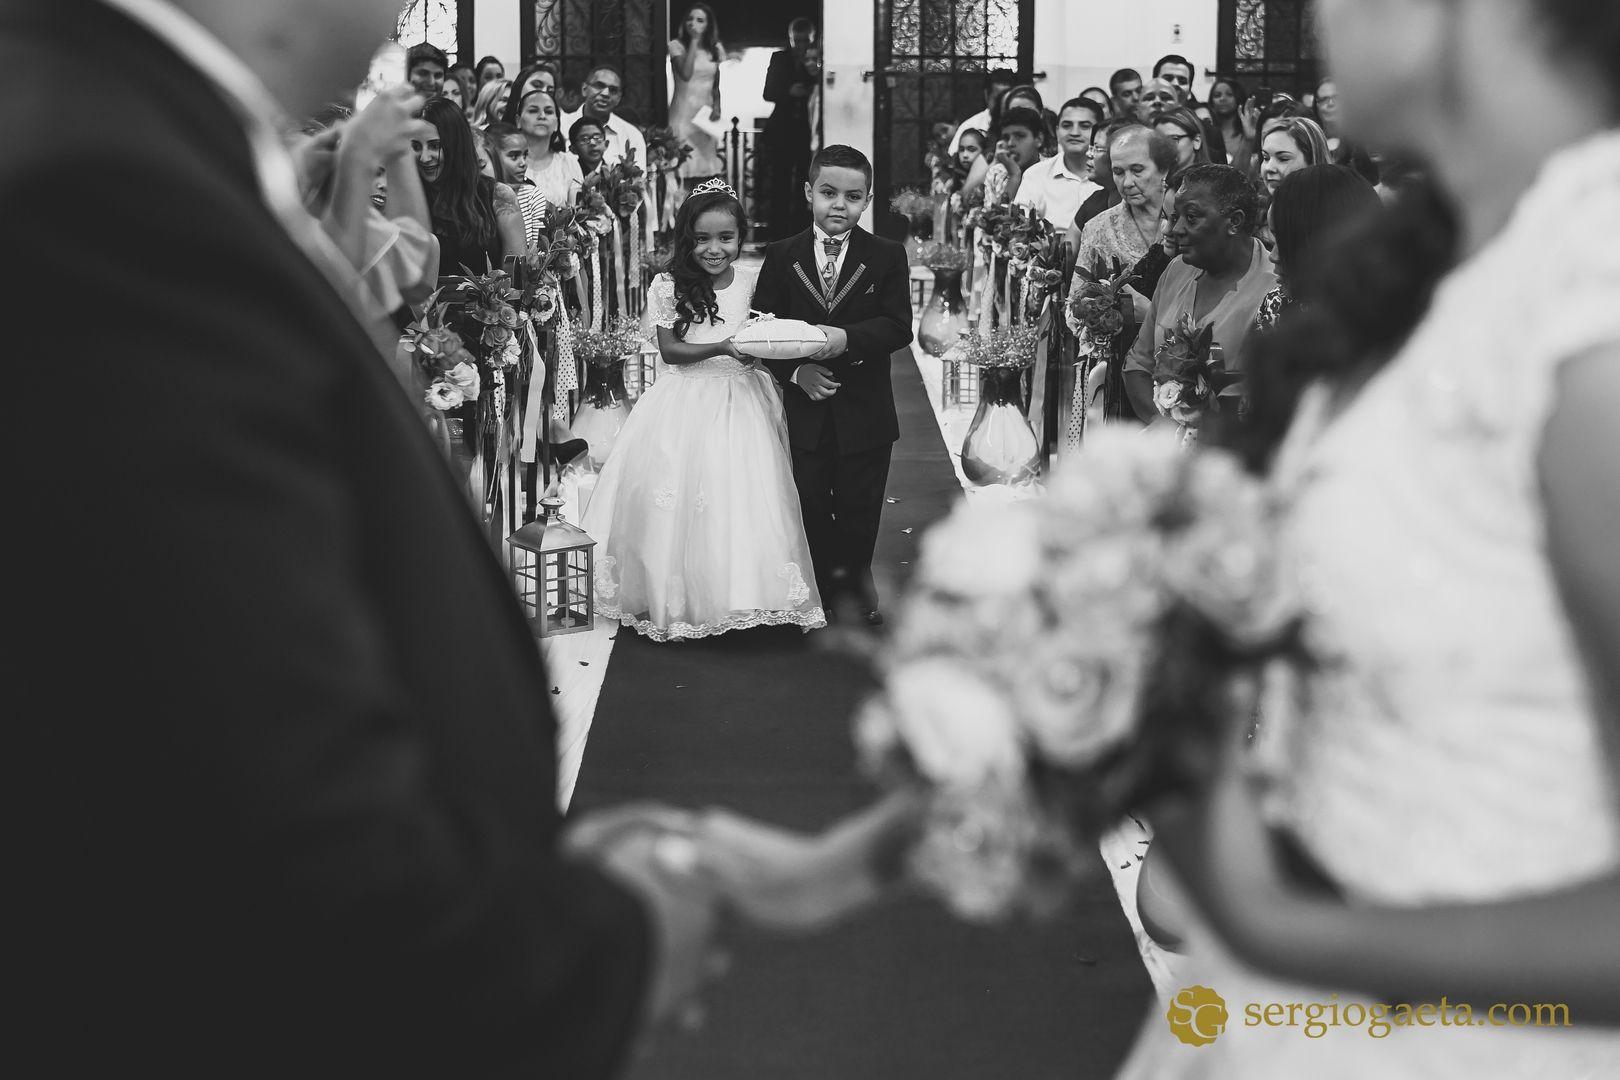 #wedding #pajen #damadehonra #noivos #novios #bride #groom #weddingphotojournalism #weddingdress #fotojornalismocasamentosp #igreja #brprofessionalphotographers #sony #sonyimages #a7ii #buque #love #aliancas #weddingrings